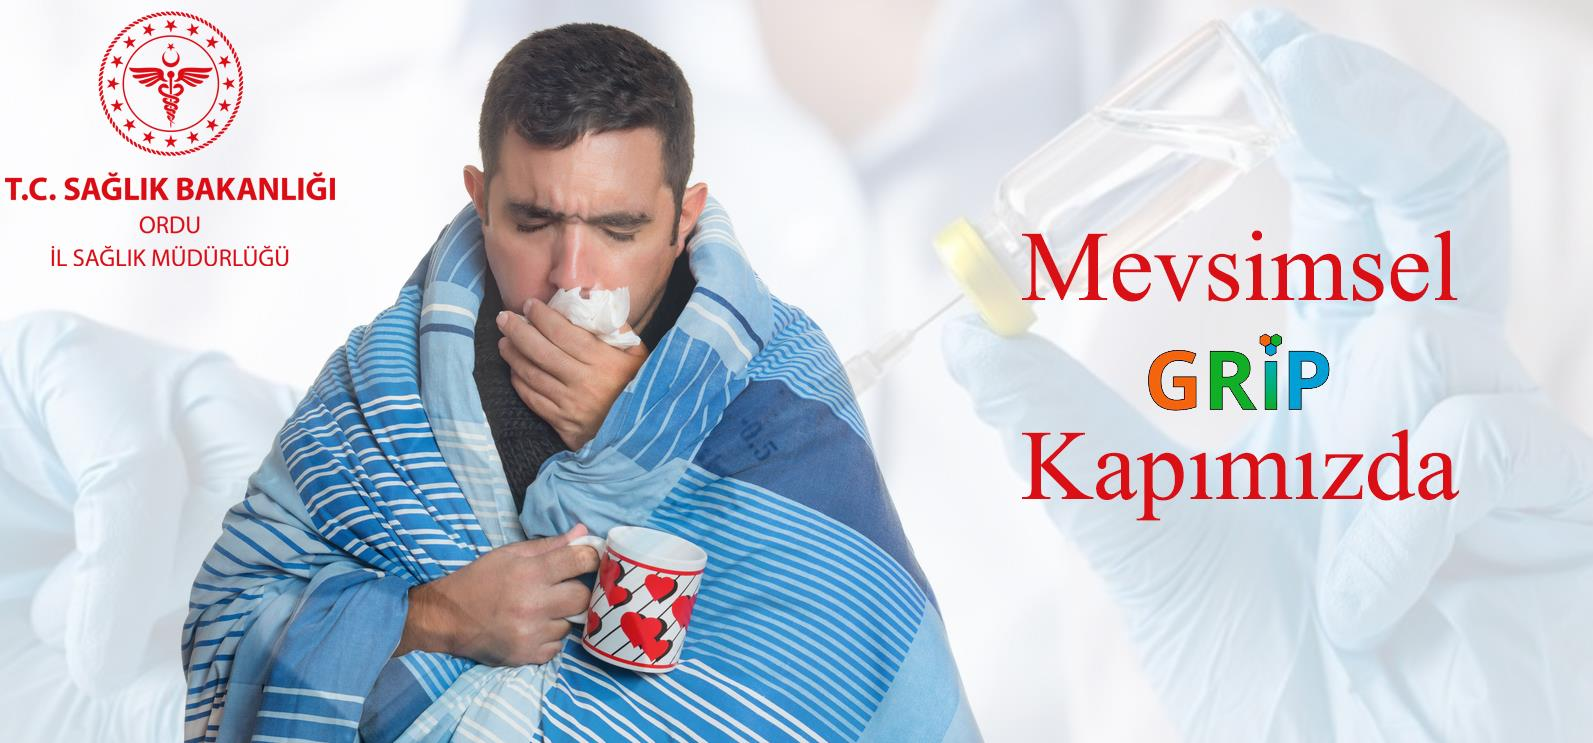 Mevsimsel Grip Kapımızda